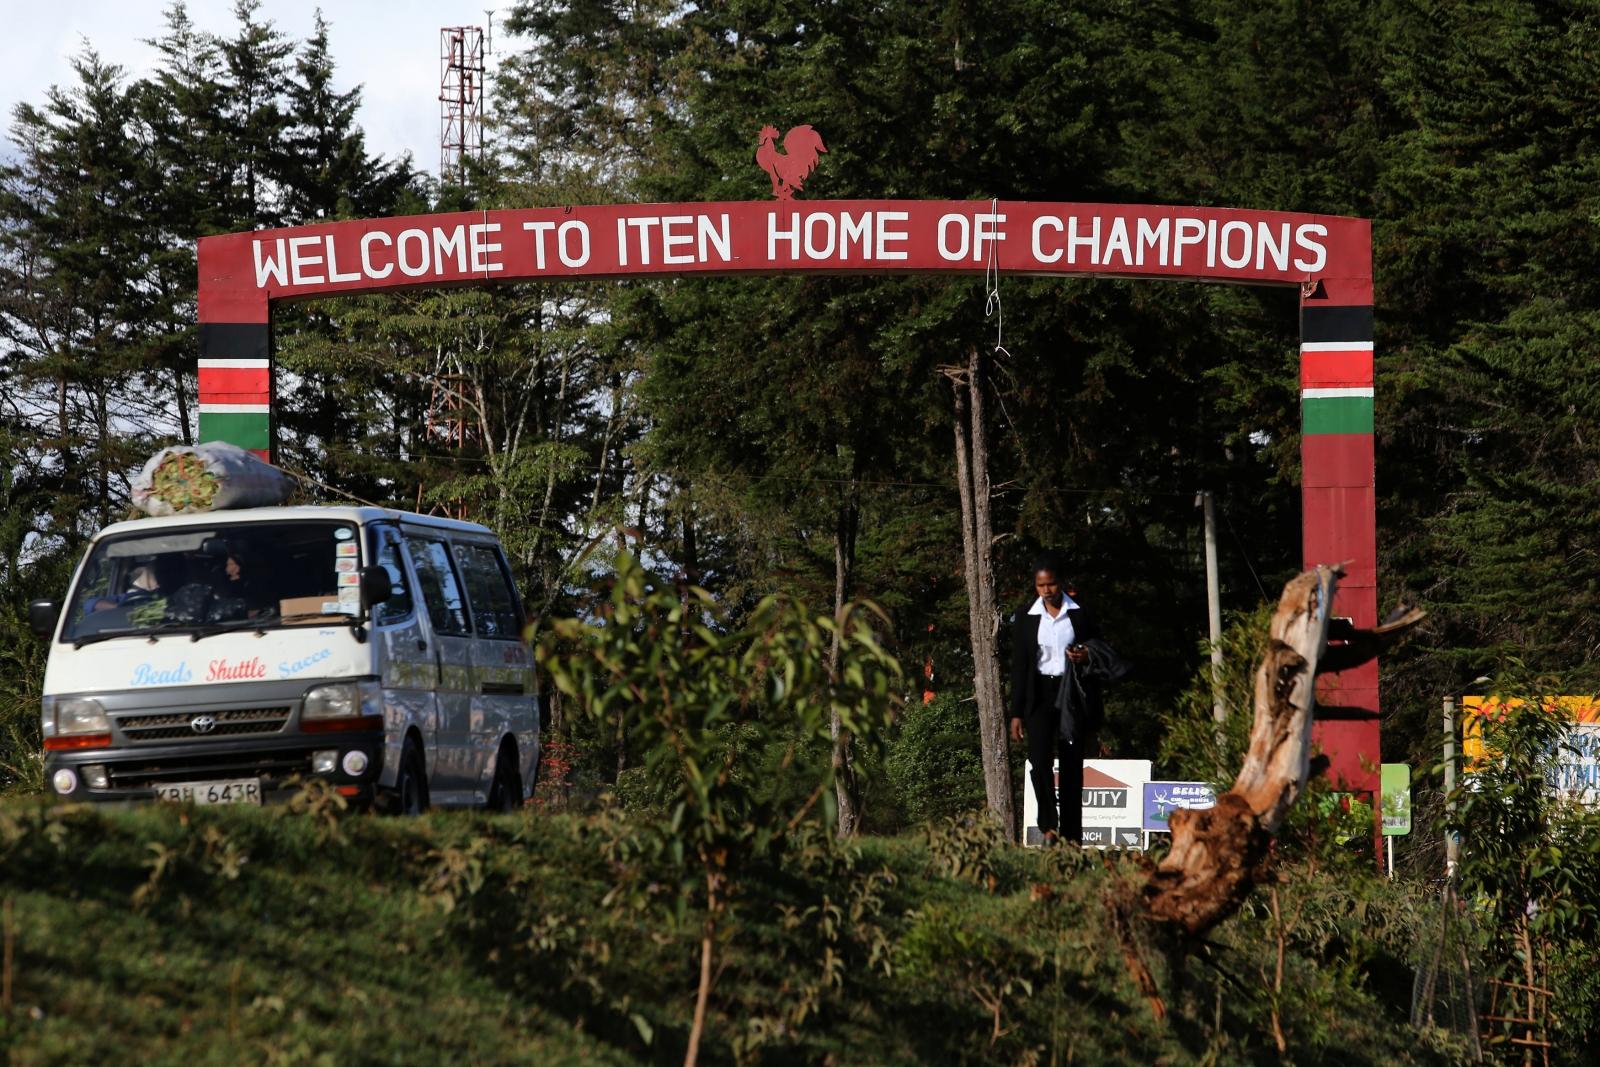 iten kenya athletics drugs sport